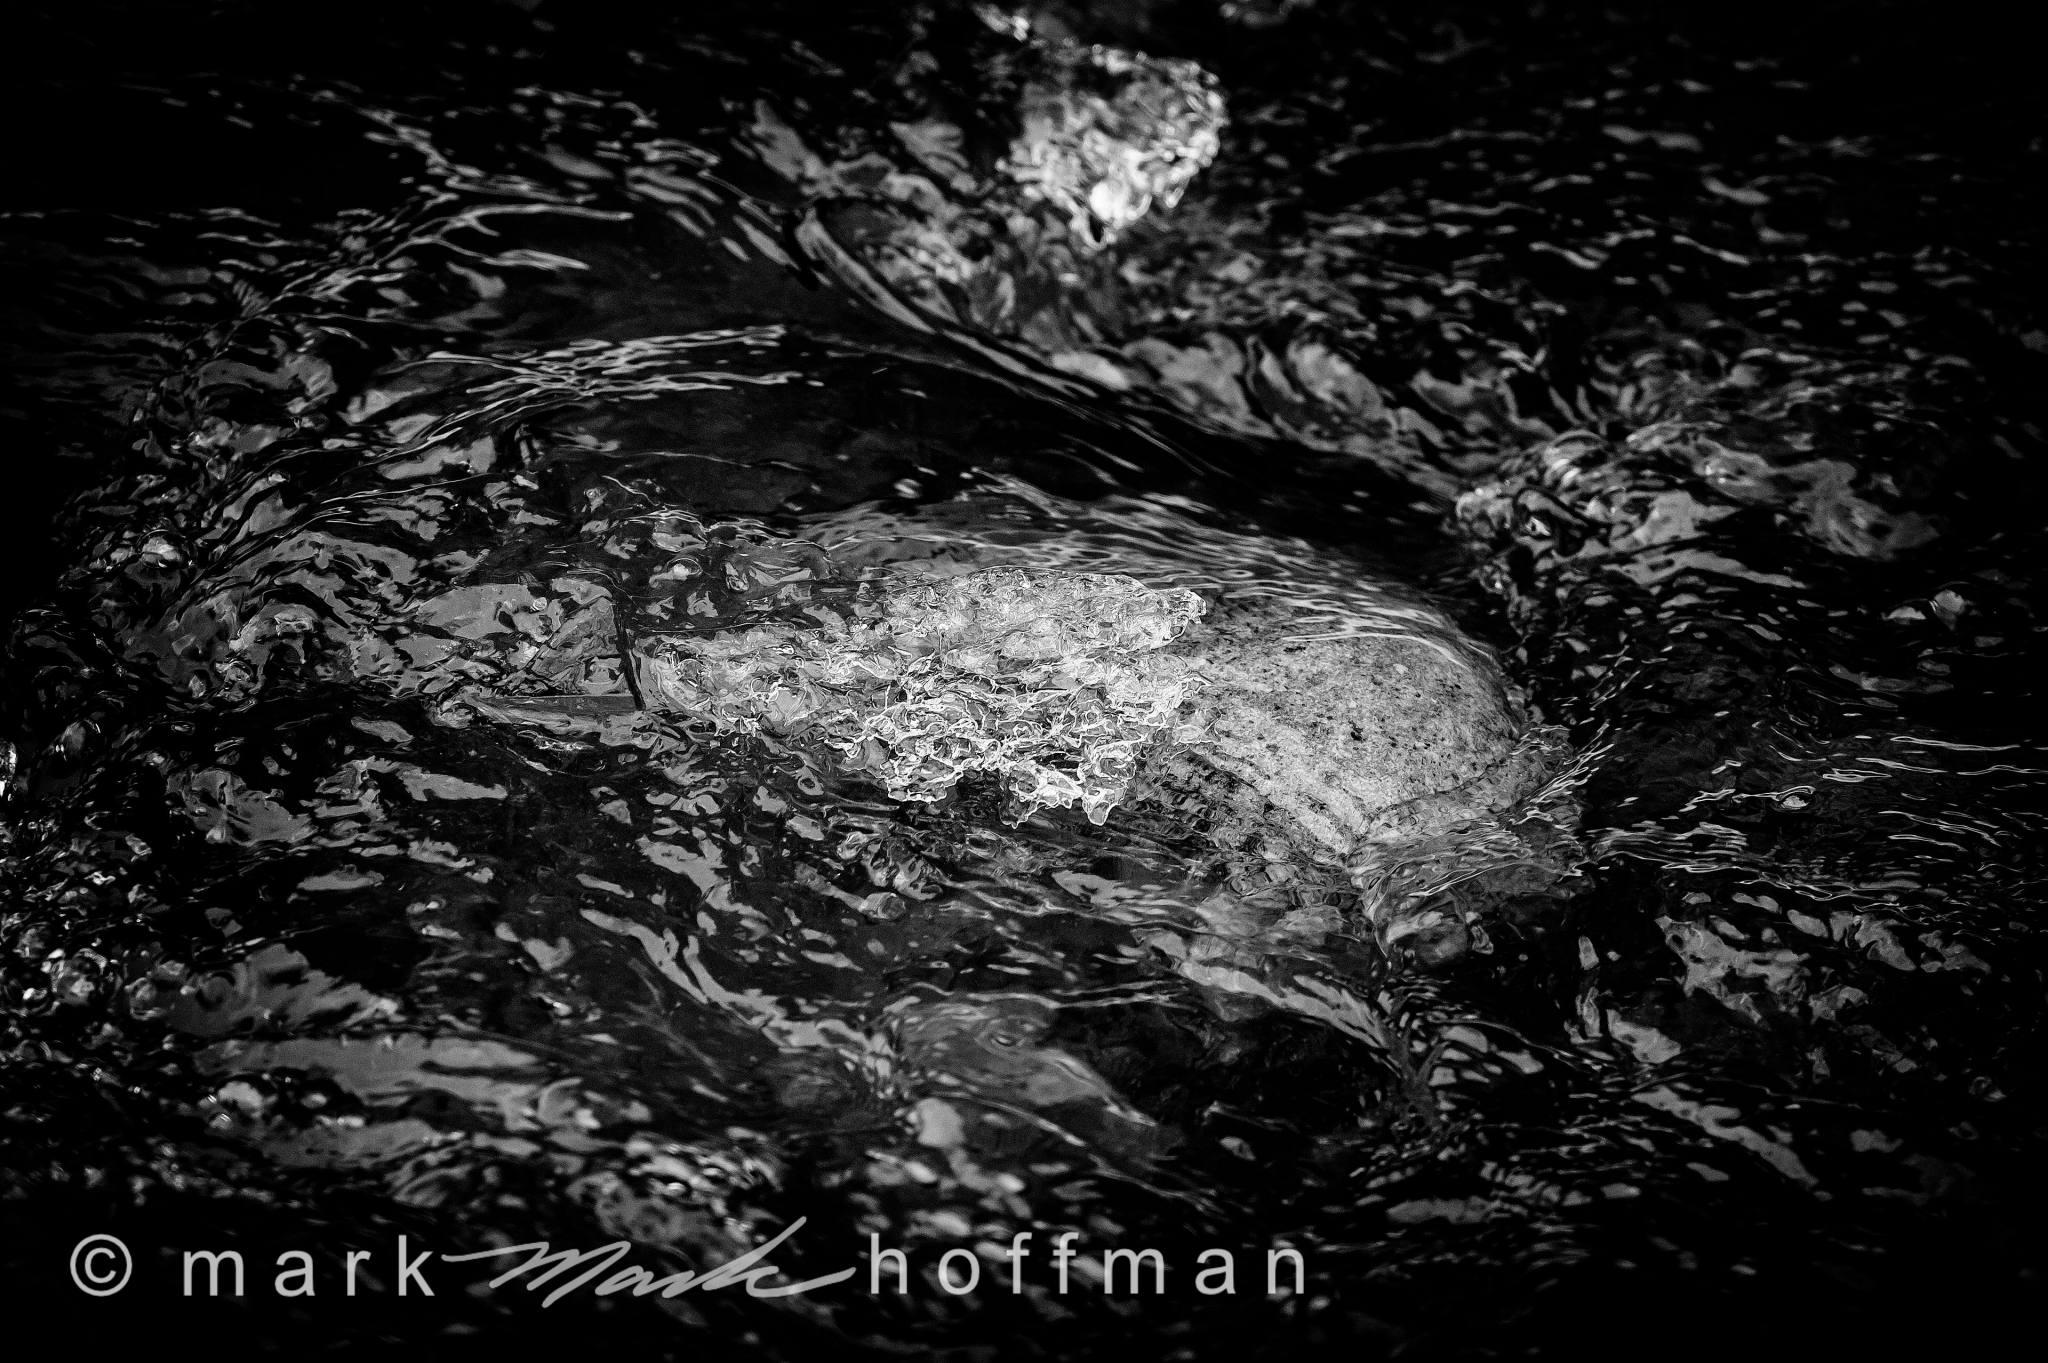 Mark_Hoffman_photophart_20160201_0010_Silv_cap1_var1.jpg